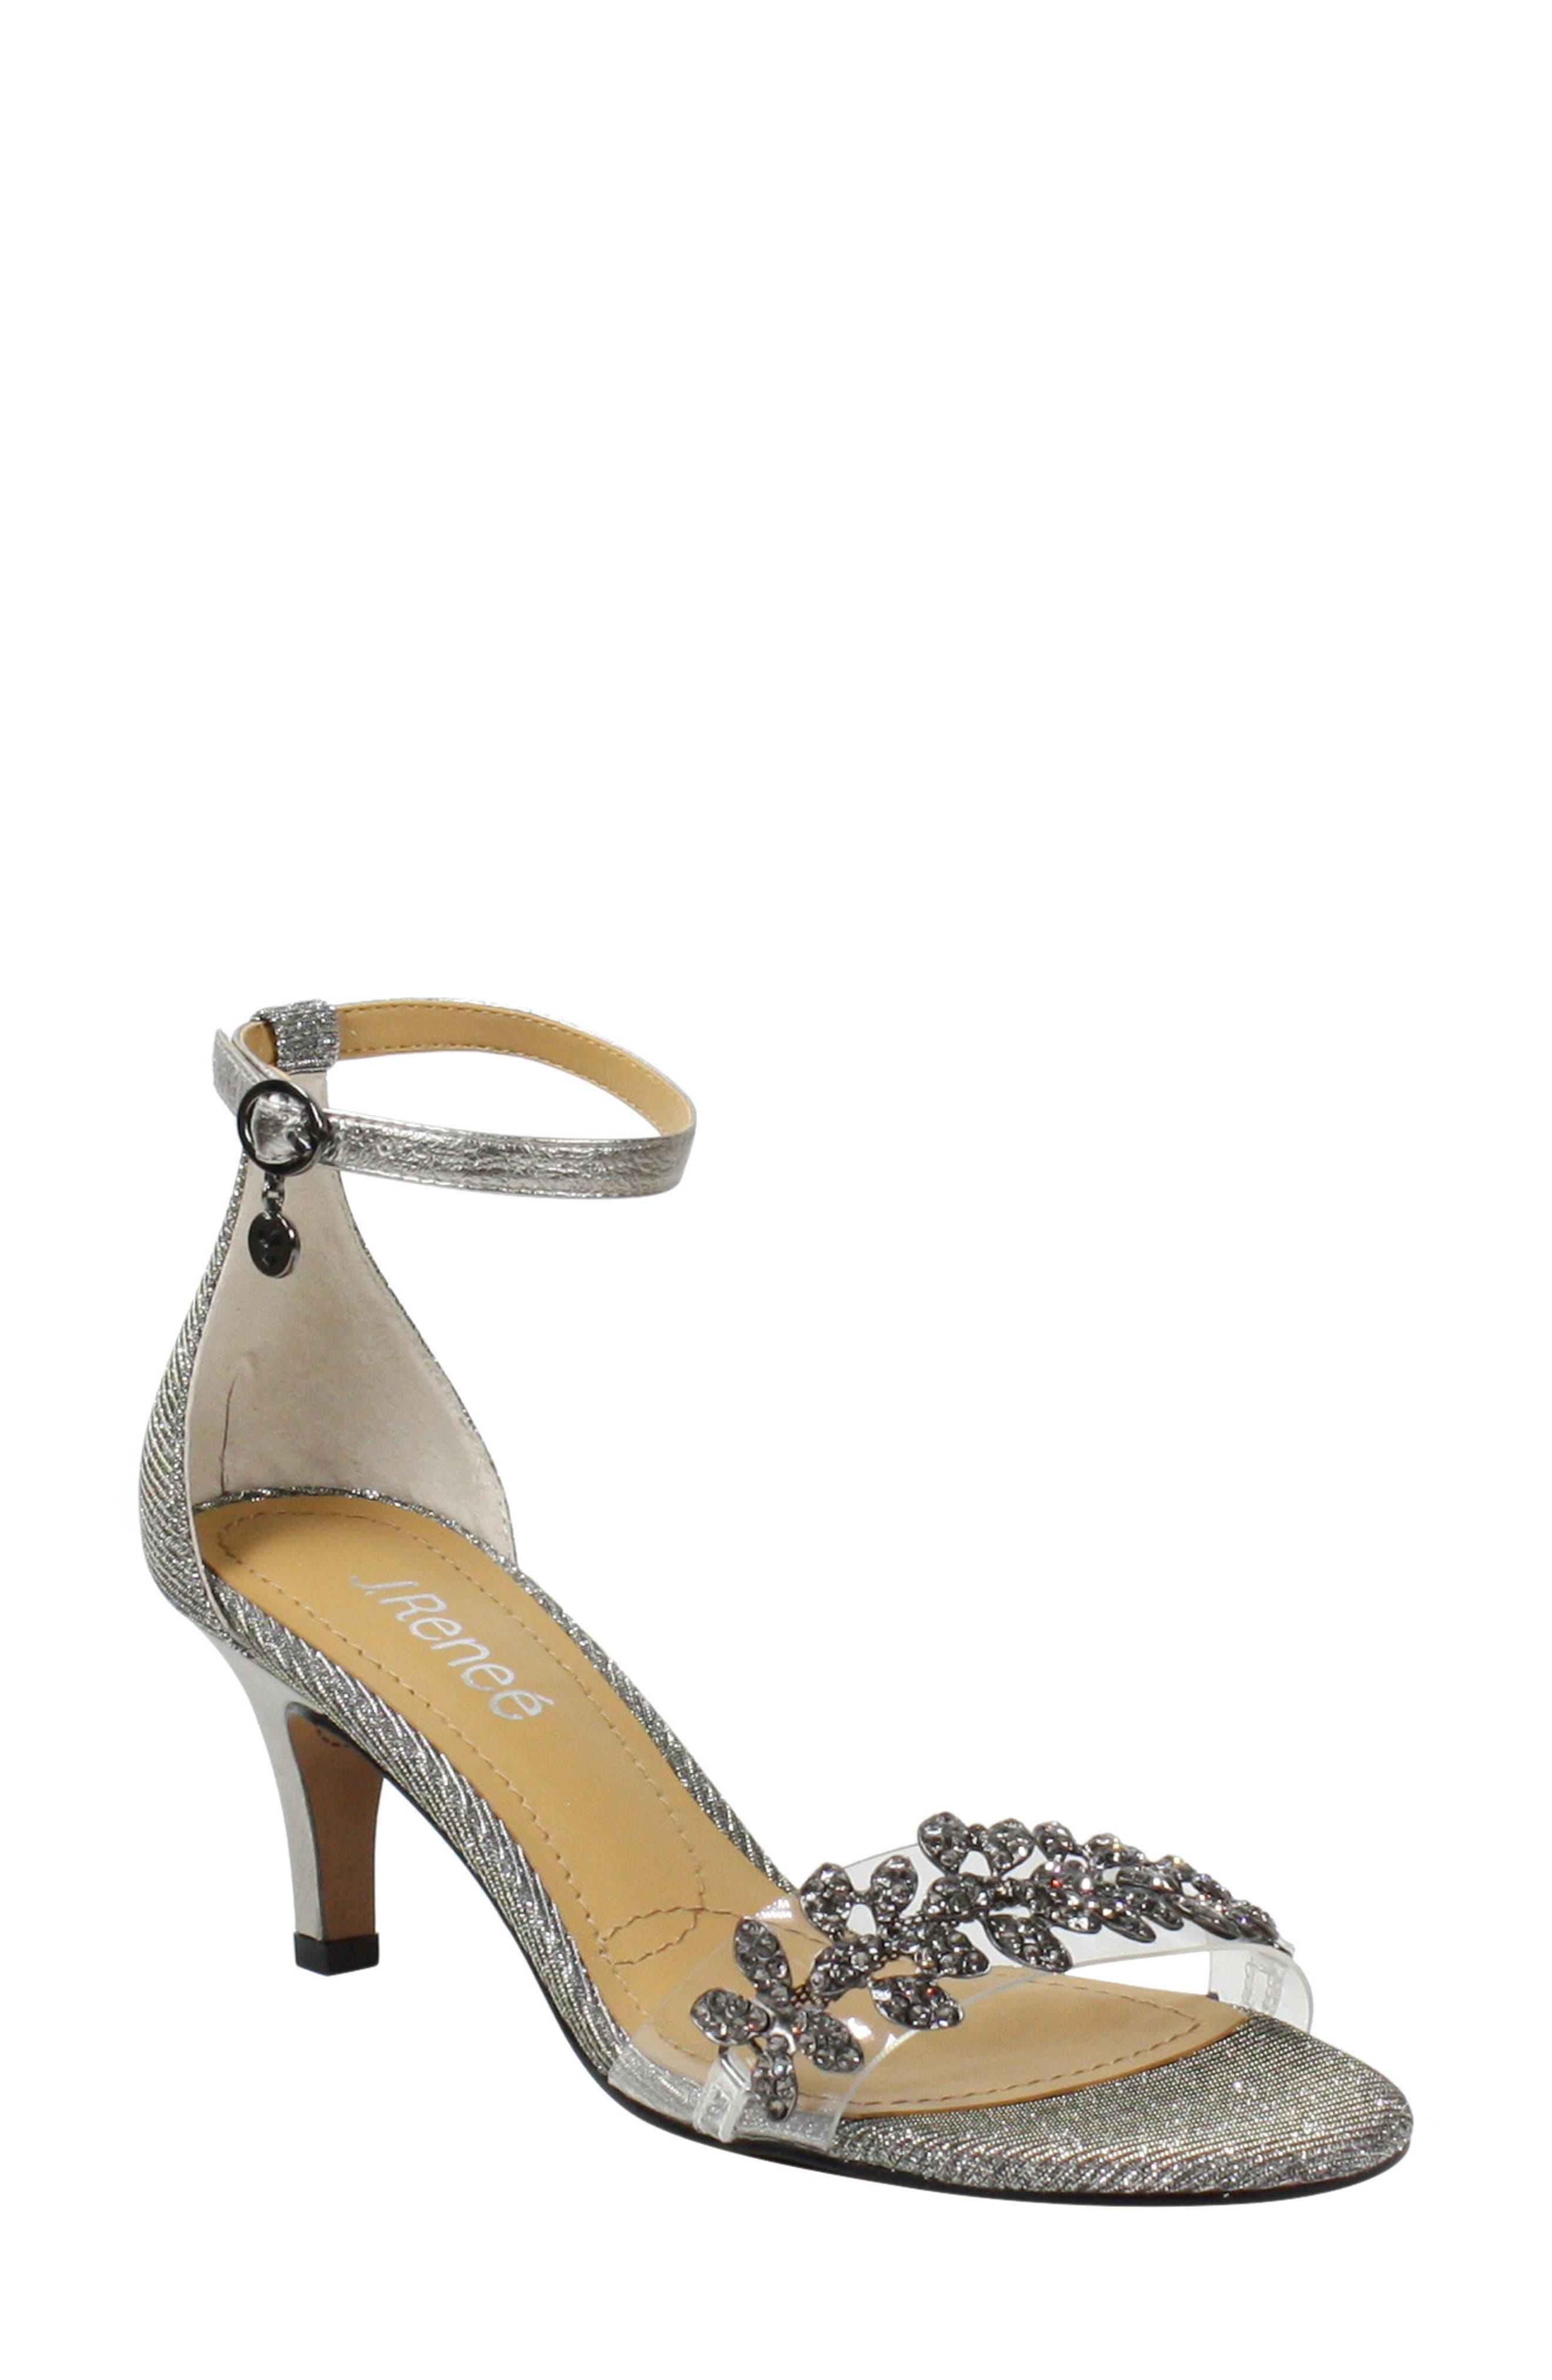 Women's J.renee Hartleigh Ankle Strap Sandal